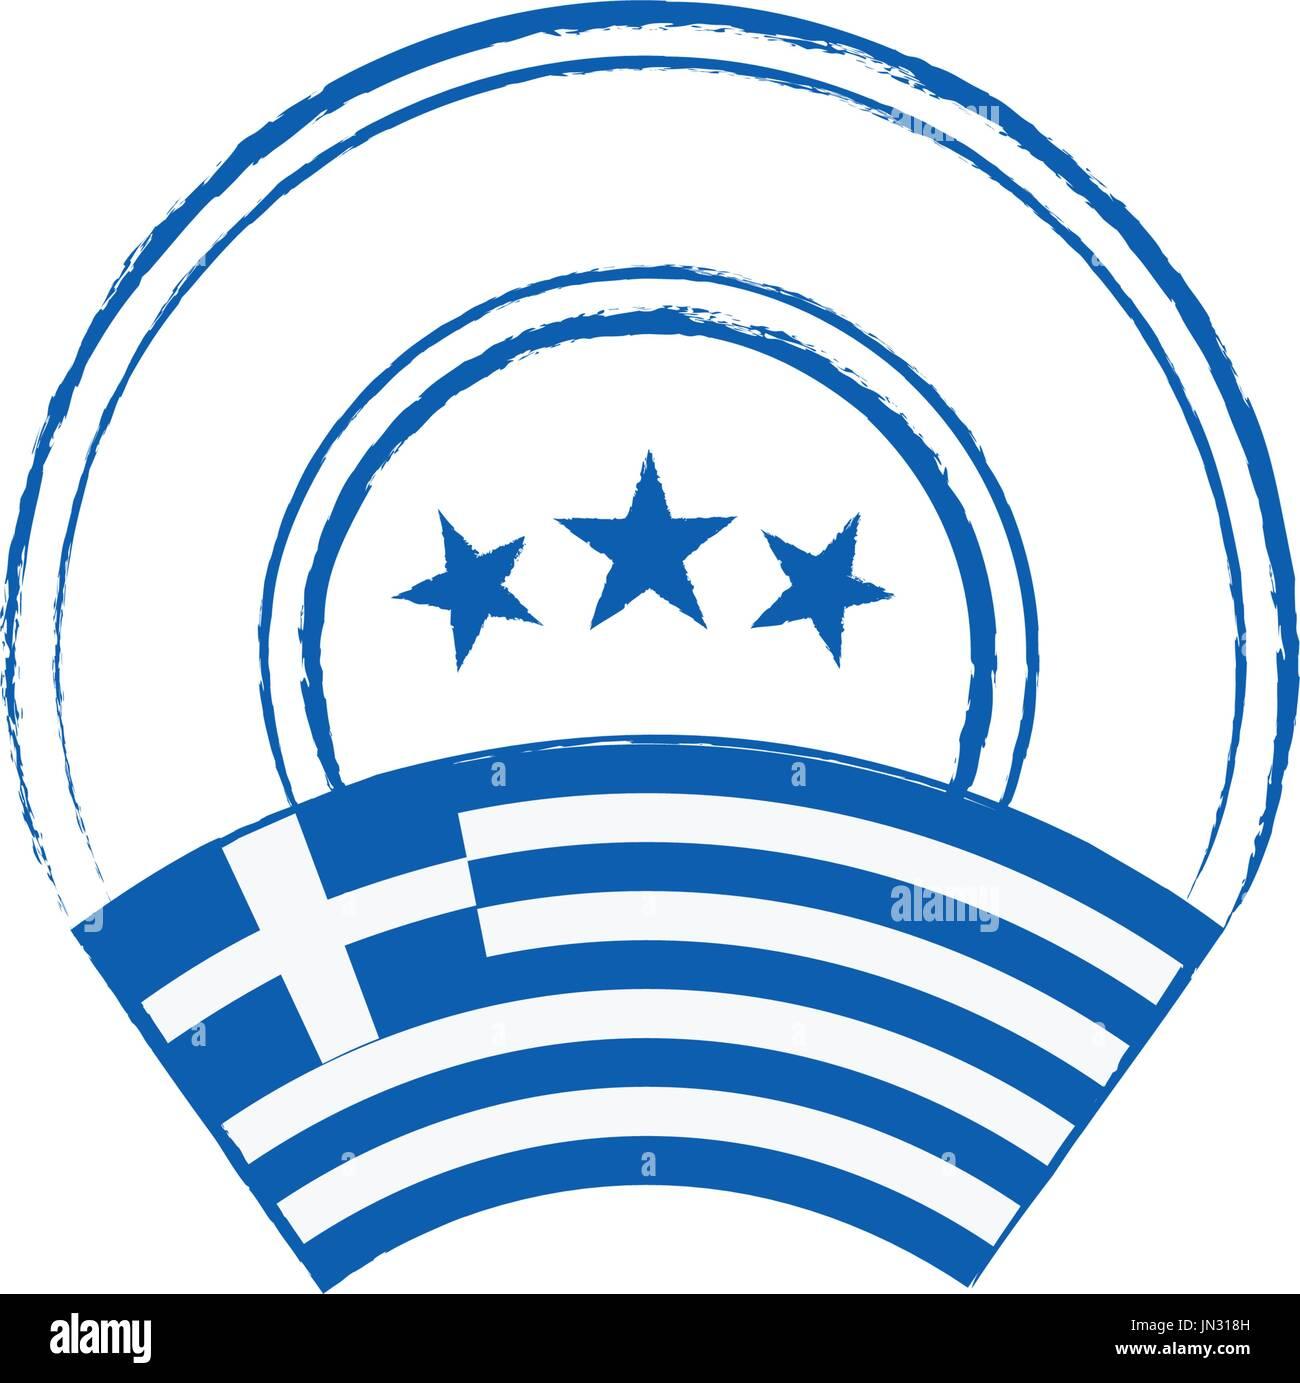 greek flag template - grunge illustration greek flag stock photos grunge